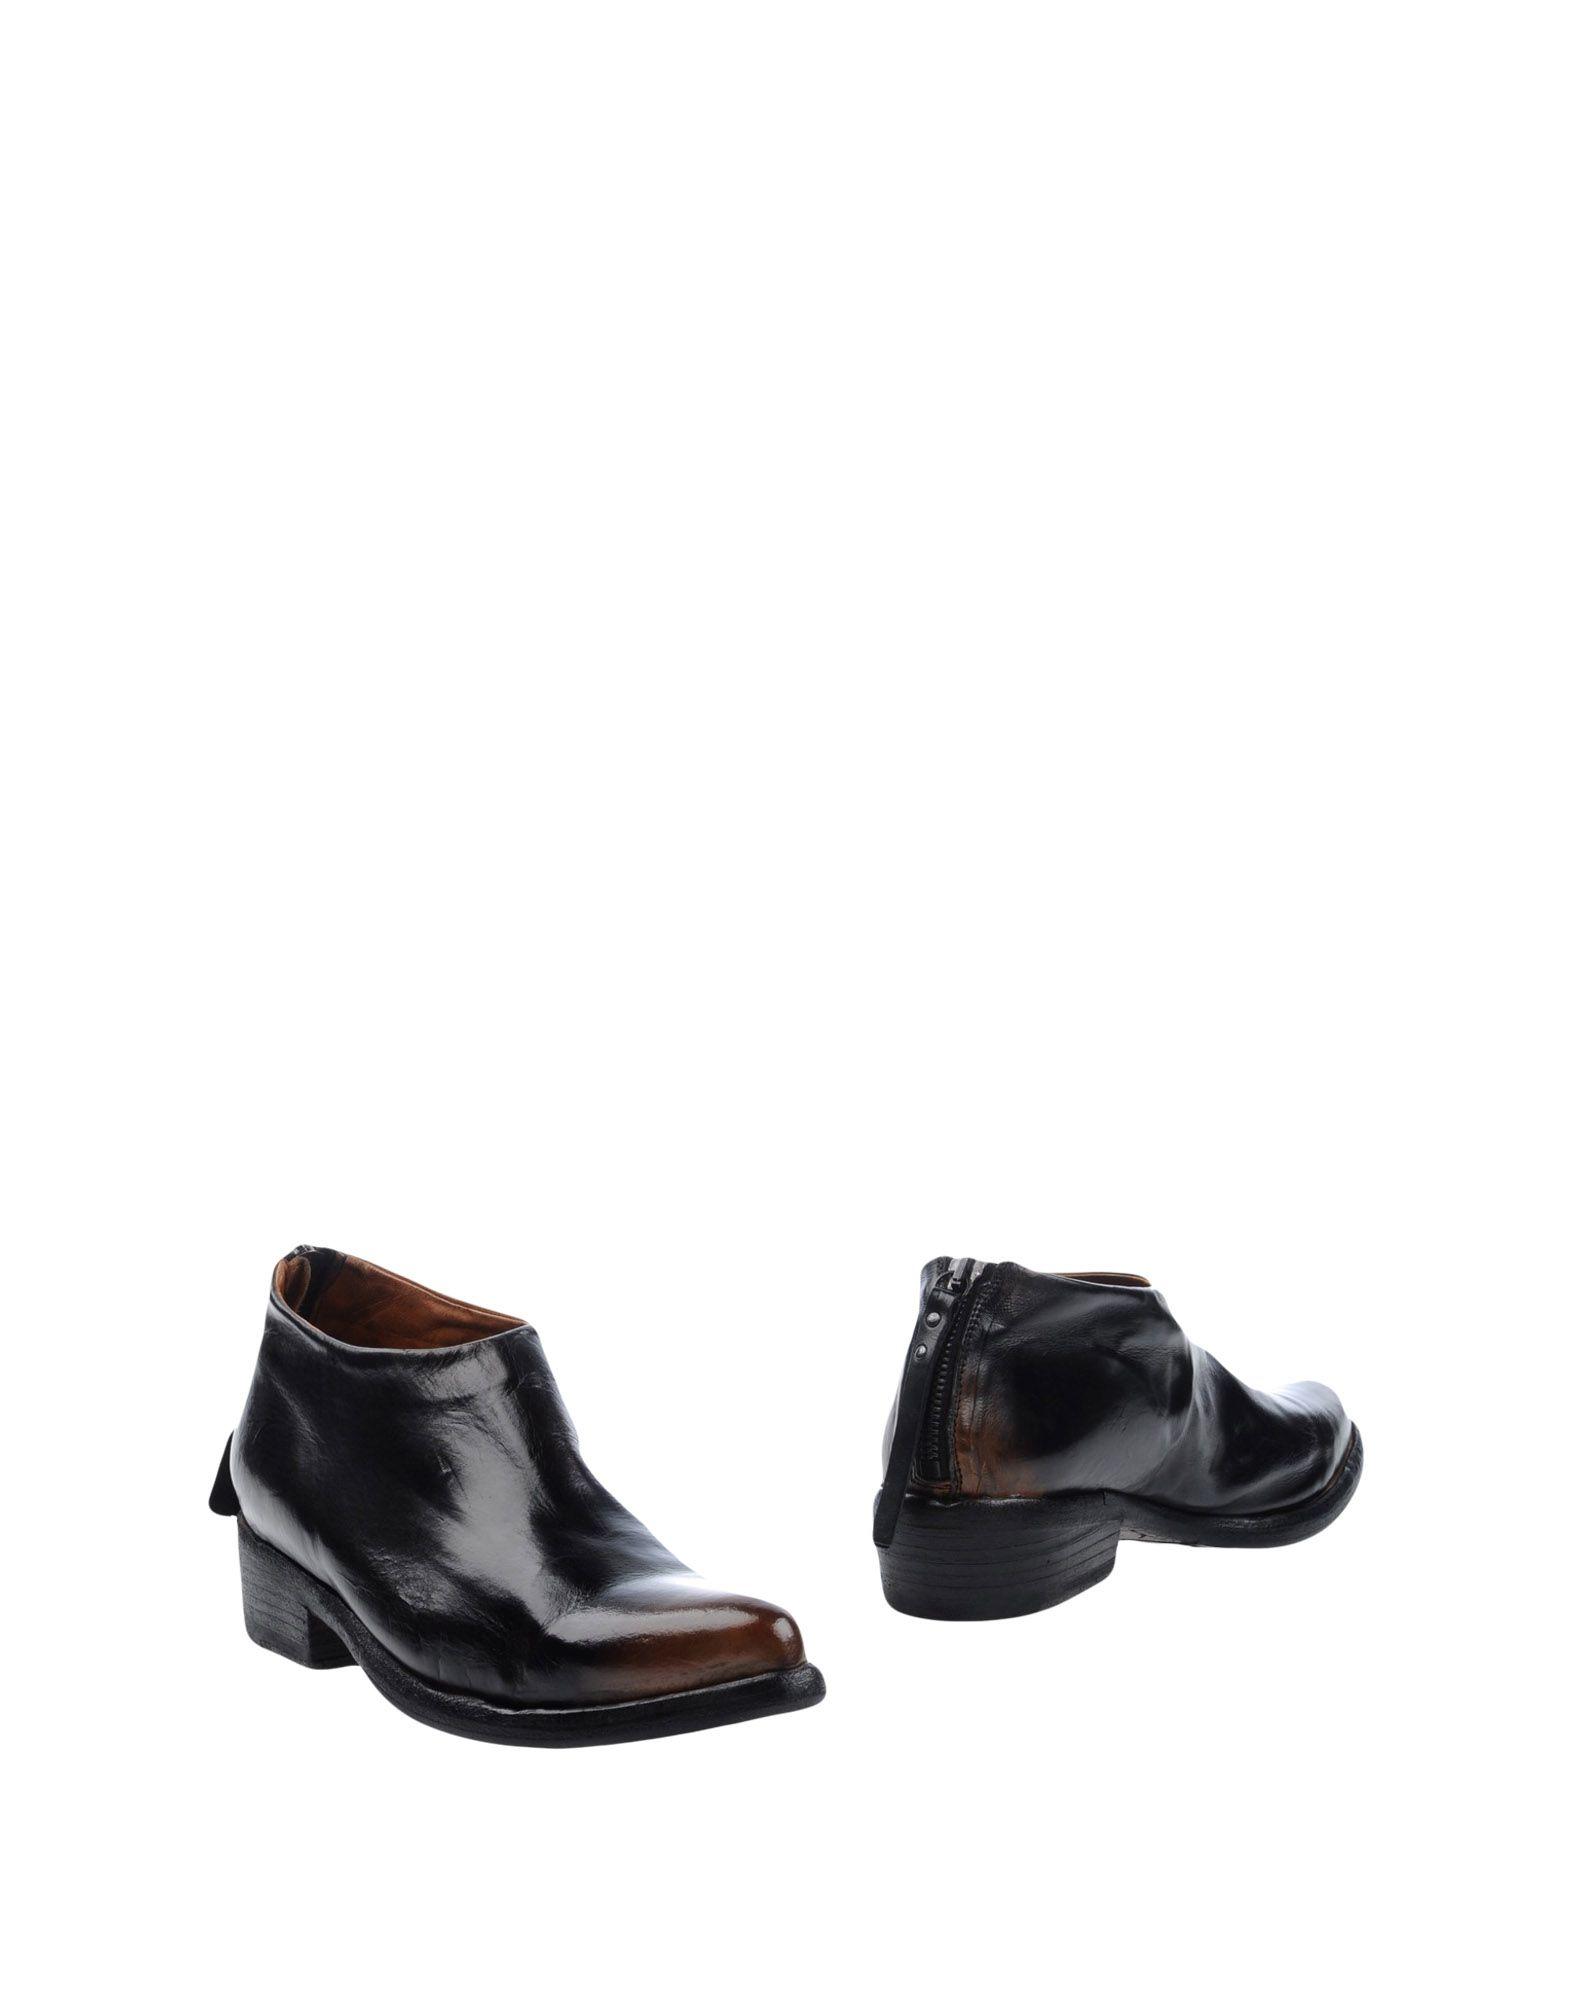 SARTORI GOLD Ankle Boot in Dark Brown